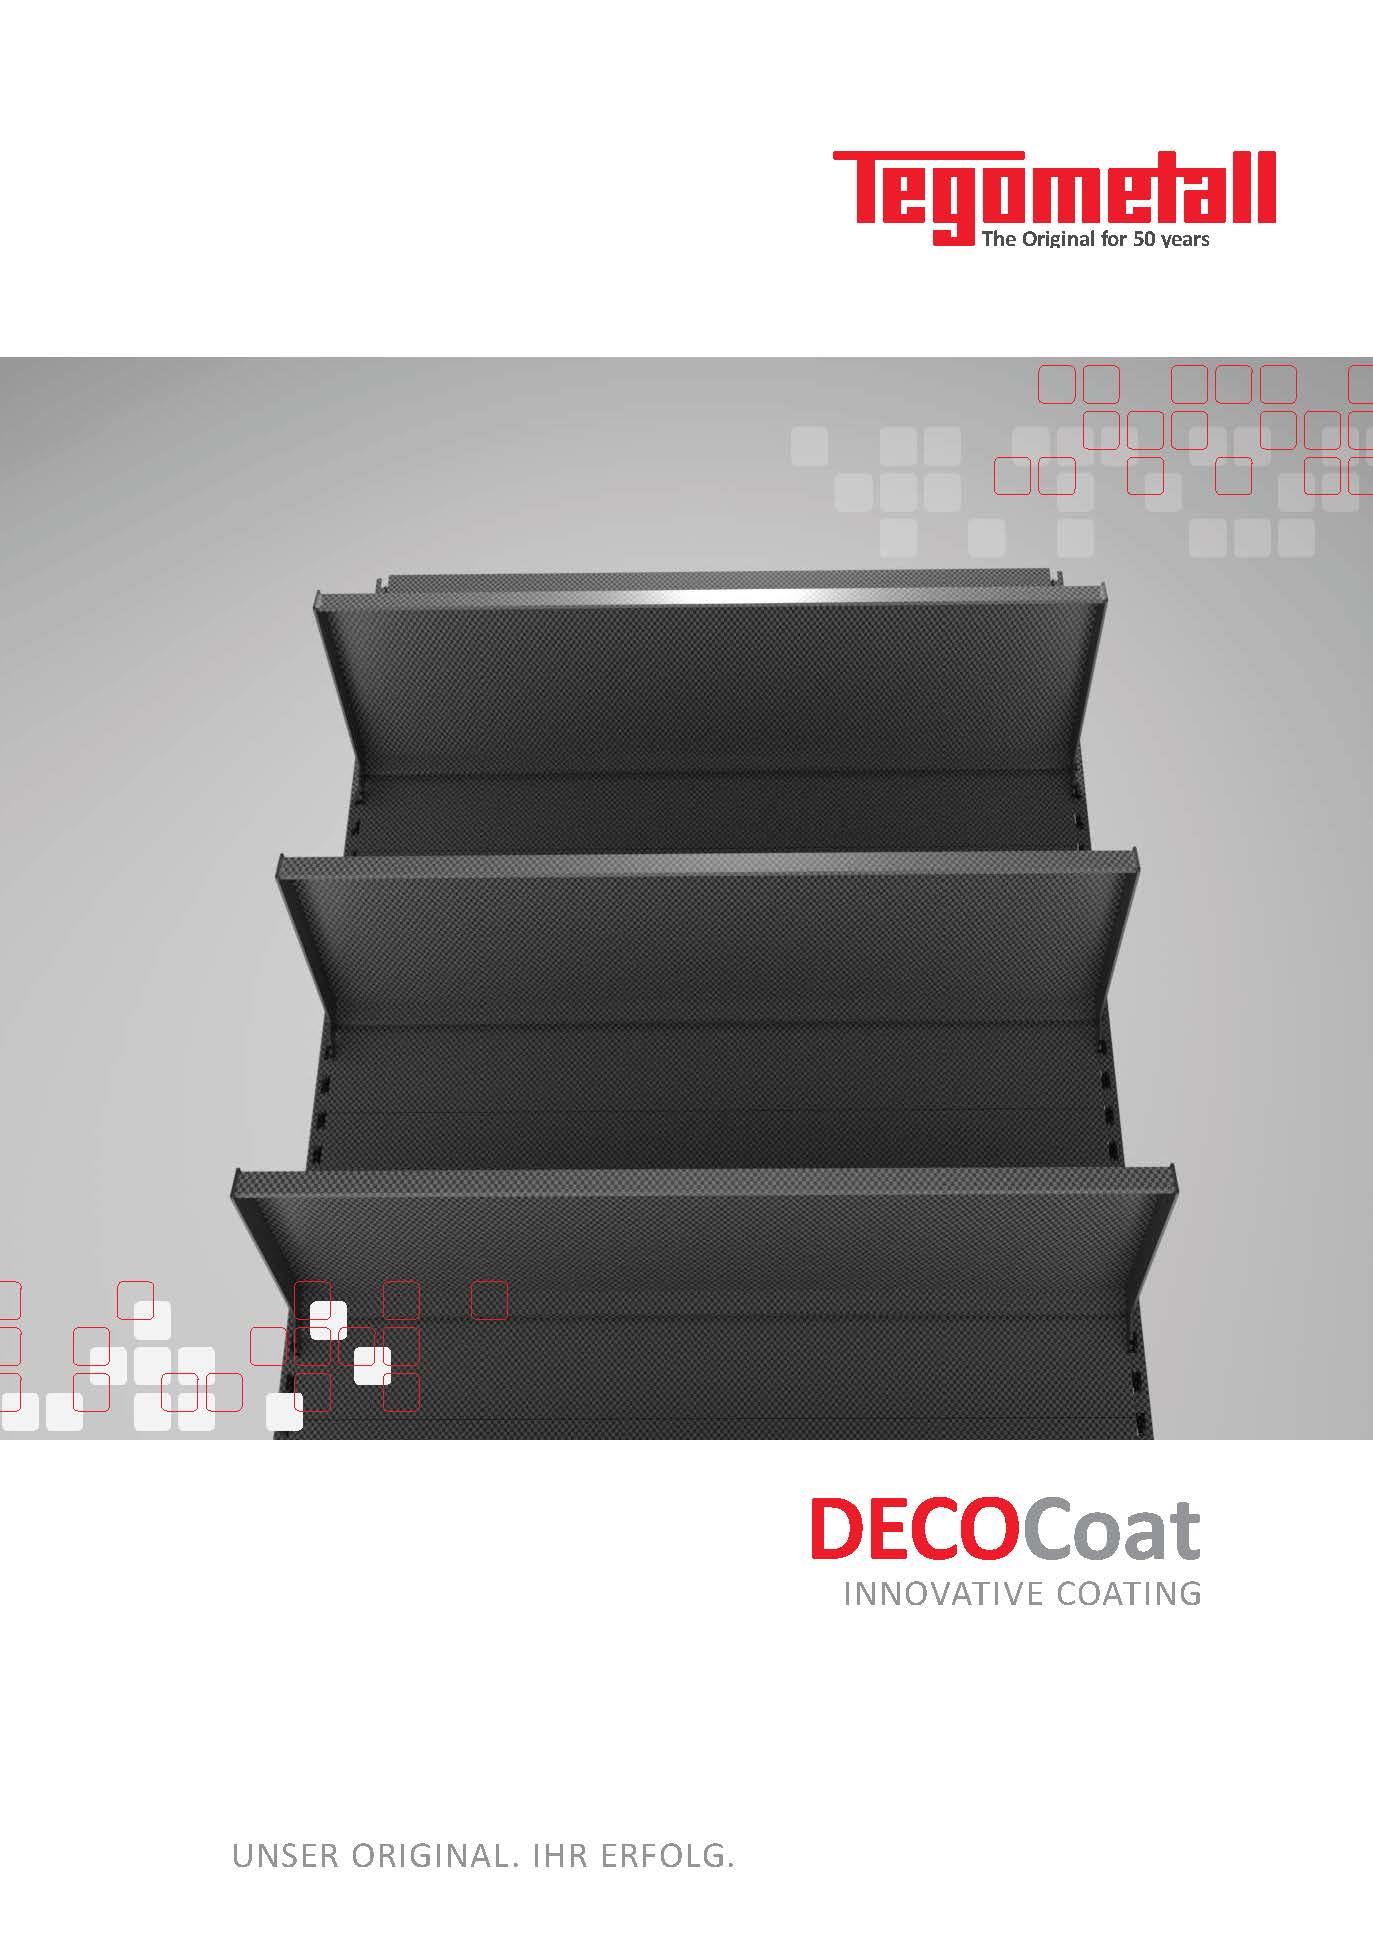 DecoCoat_katalog_EN_web_1_Page_01.jpg